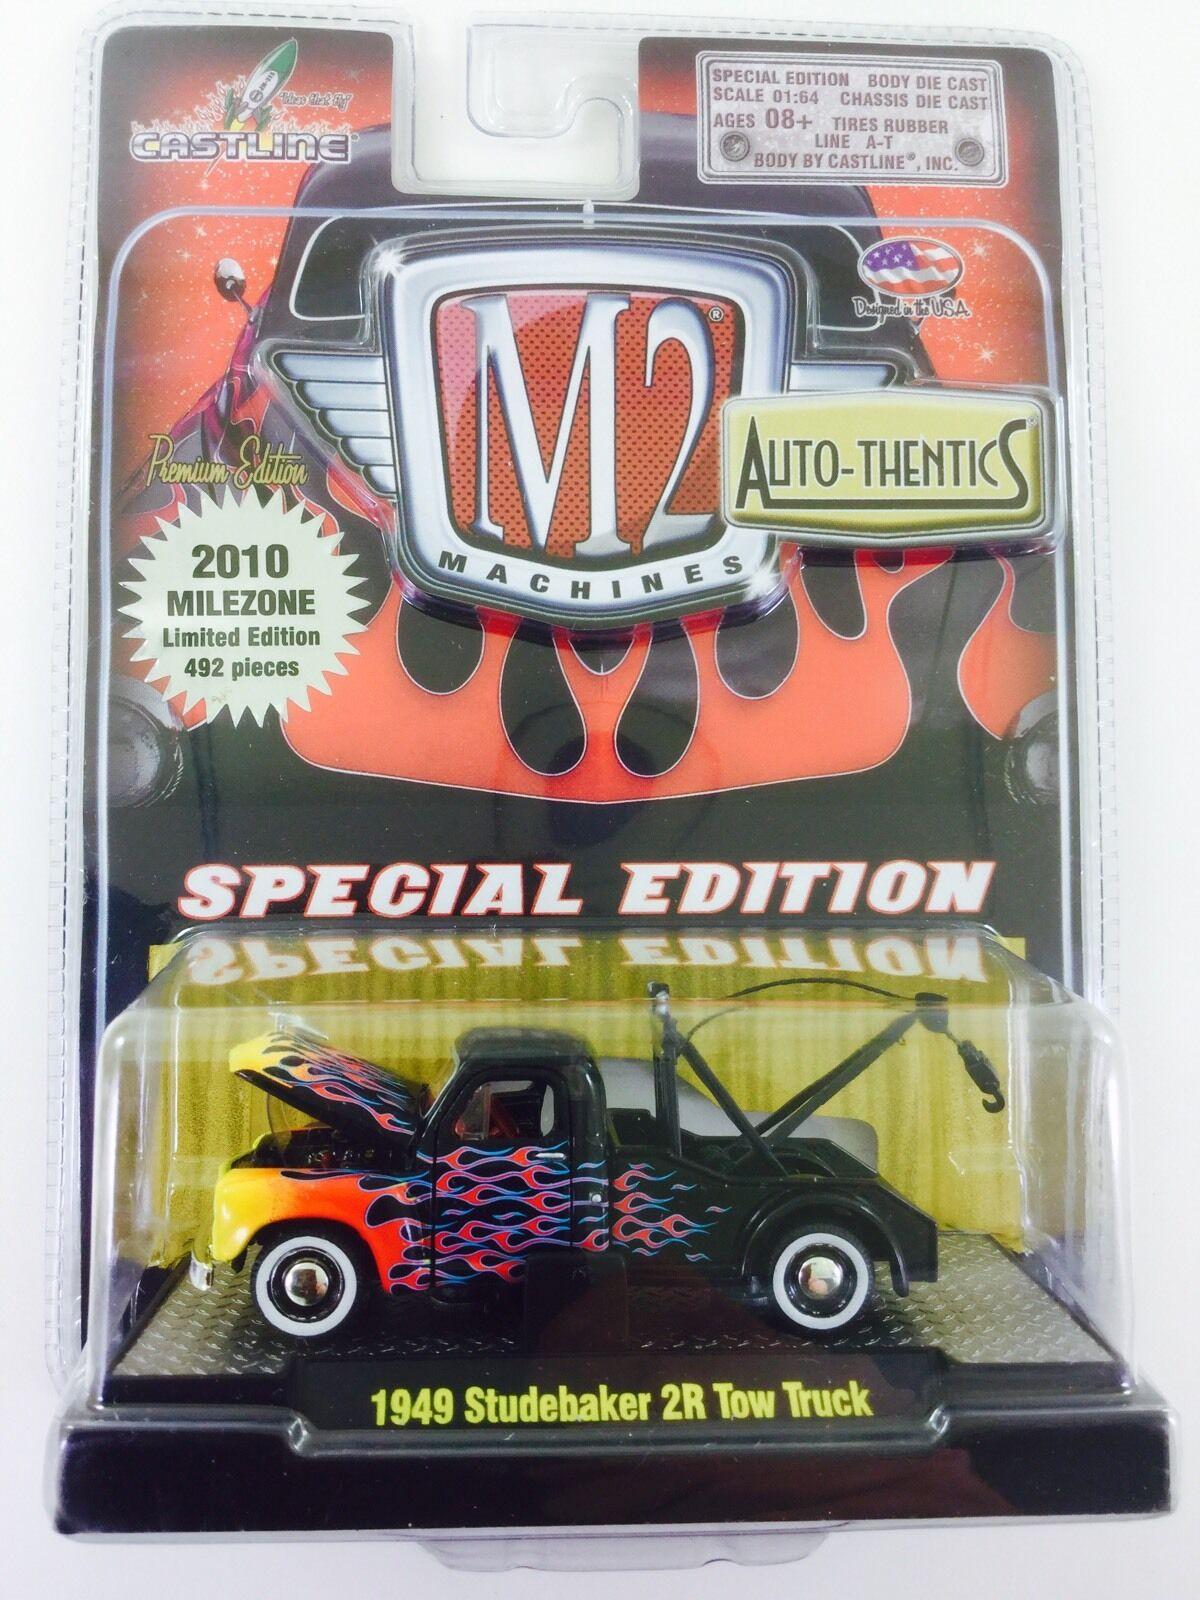 La M2 máquina milezone 1949 Studebaker grúa limitada a 492 Piezas 99%